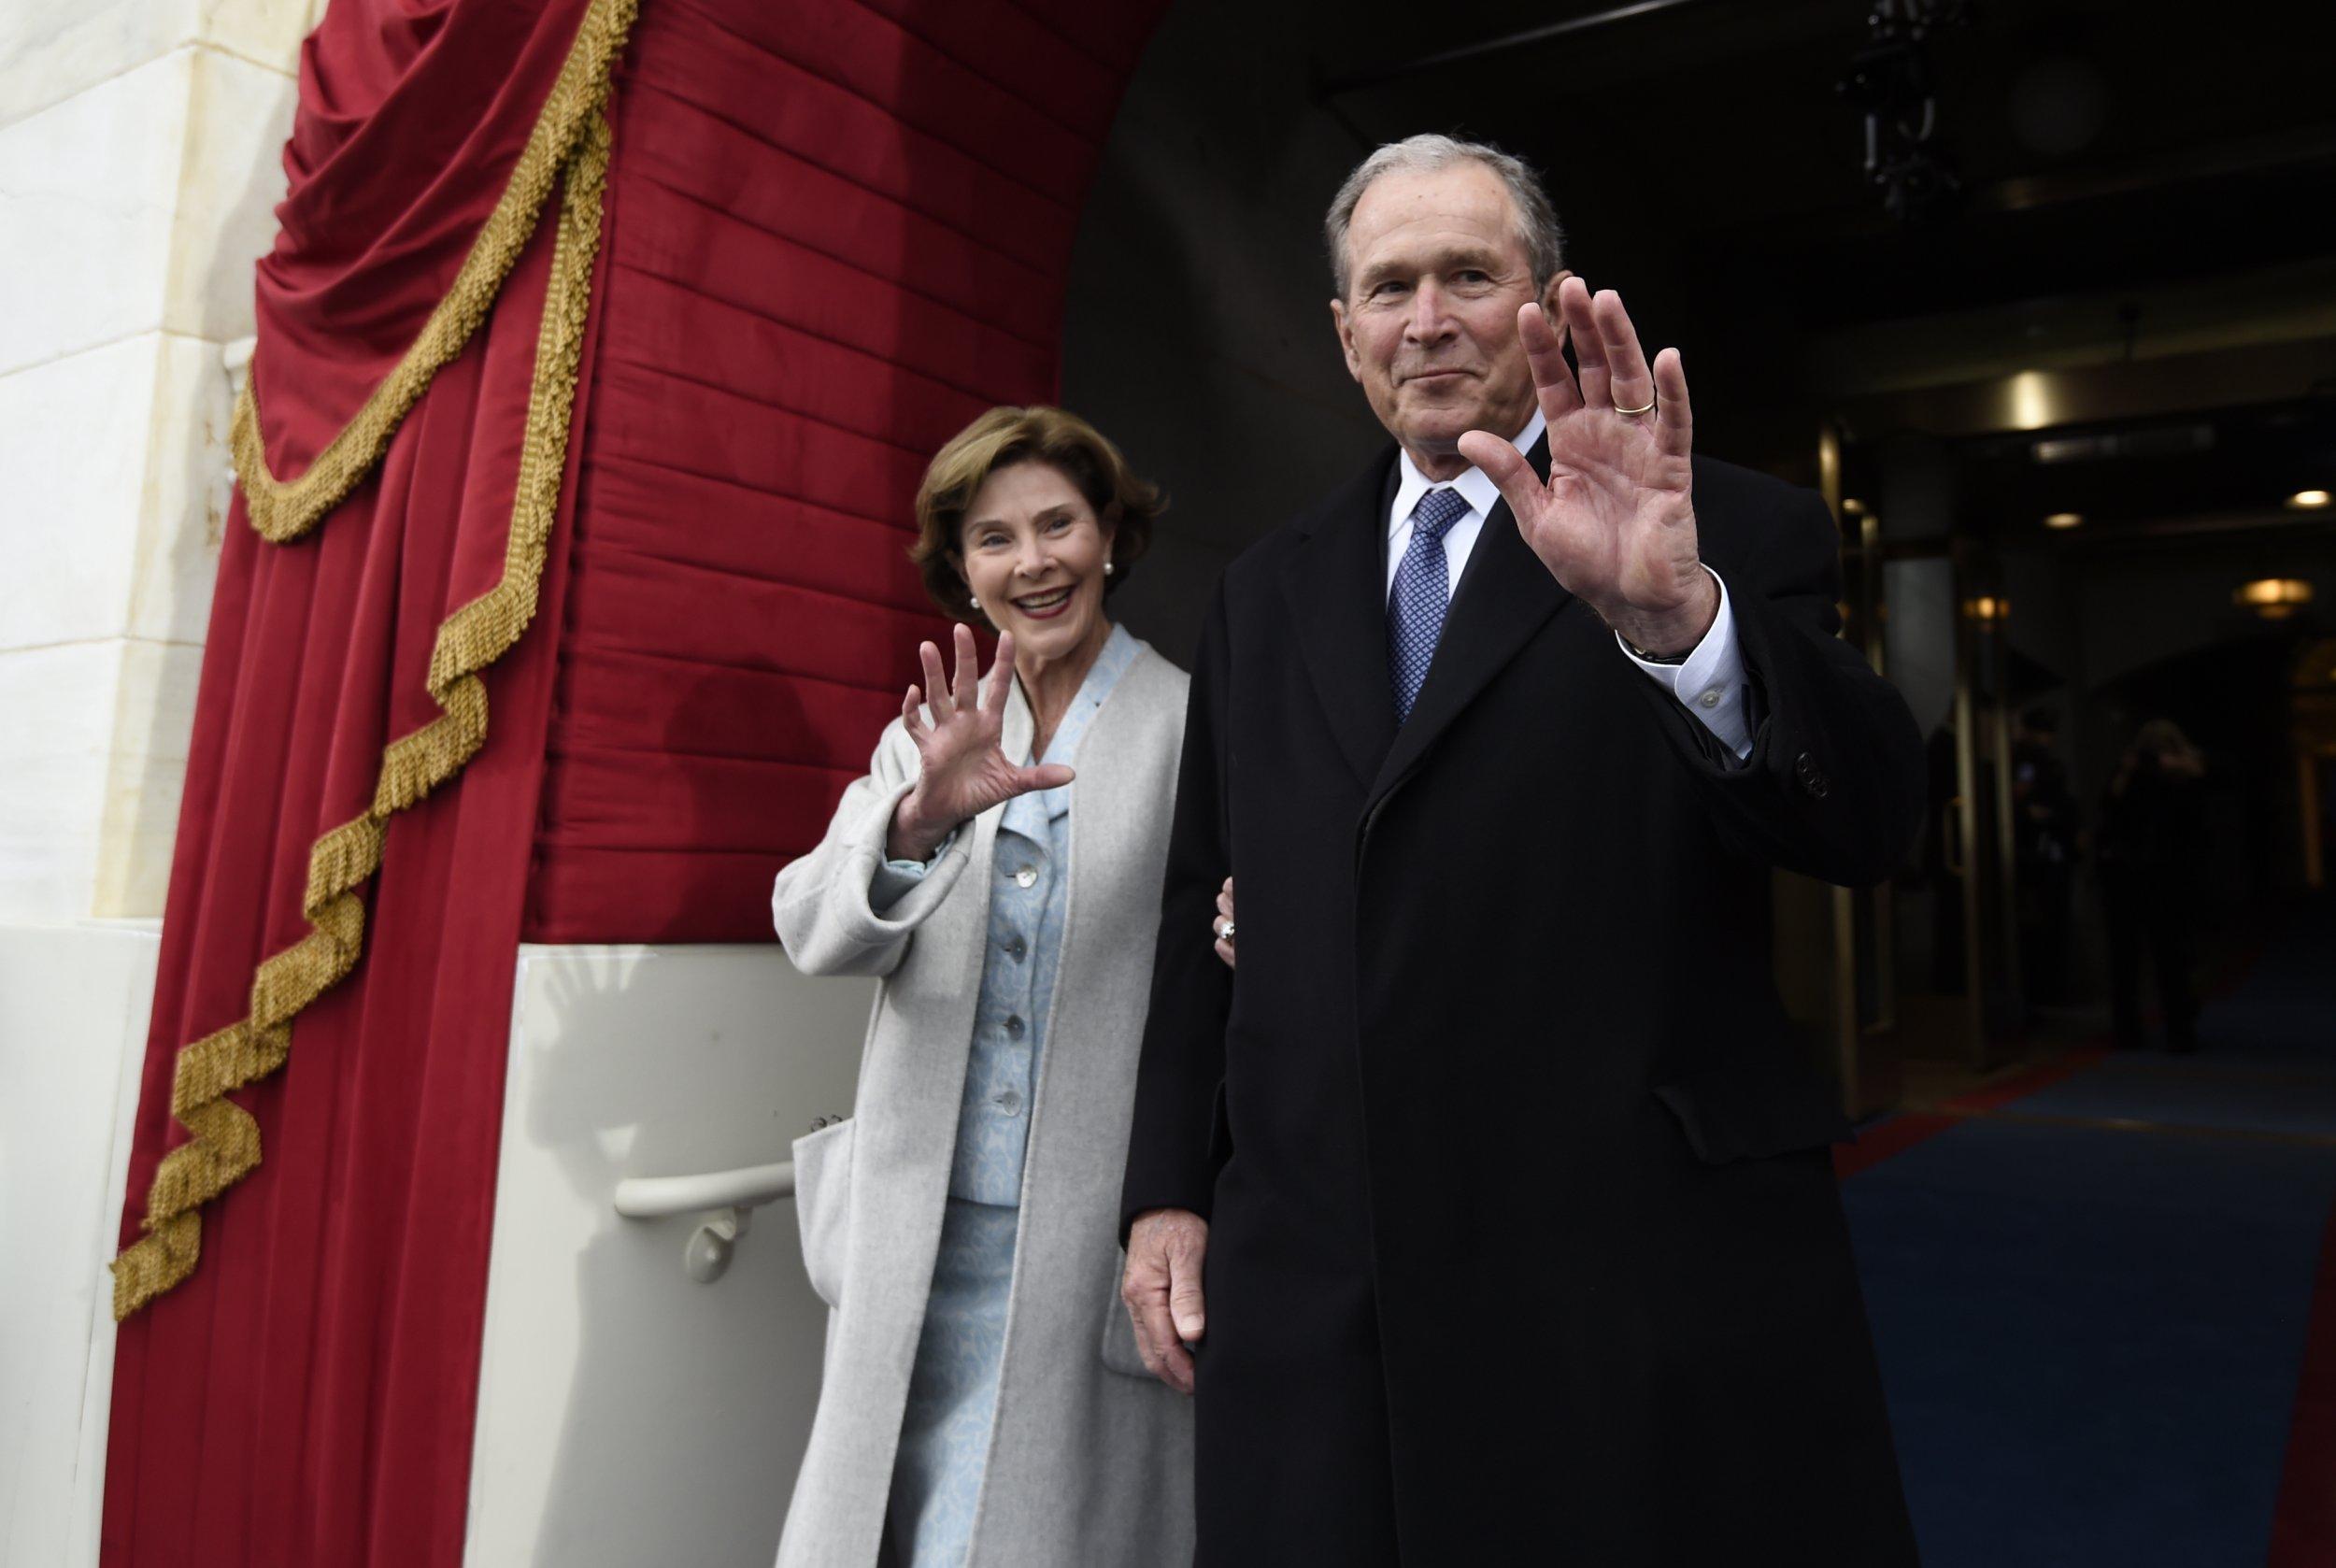 29_09_George_W_Bush_Trump_travel_ban_North_Korea